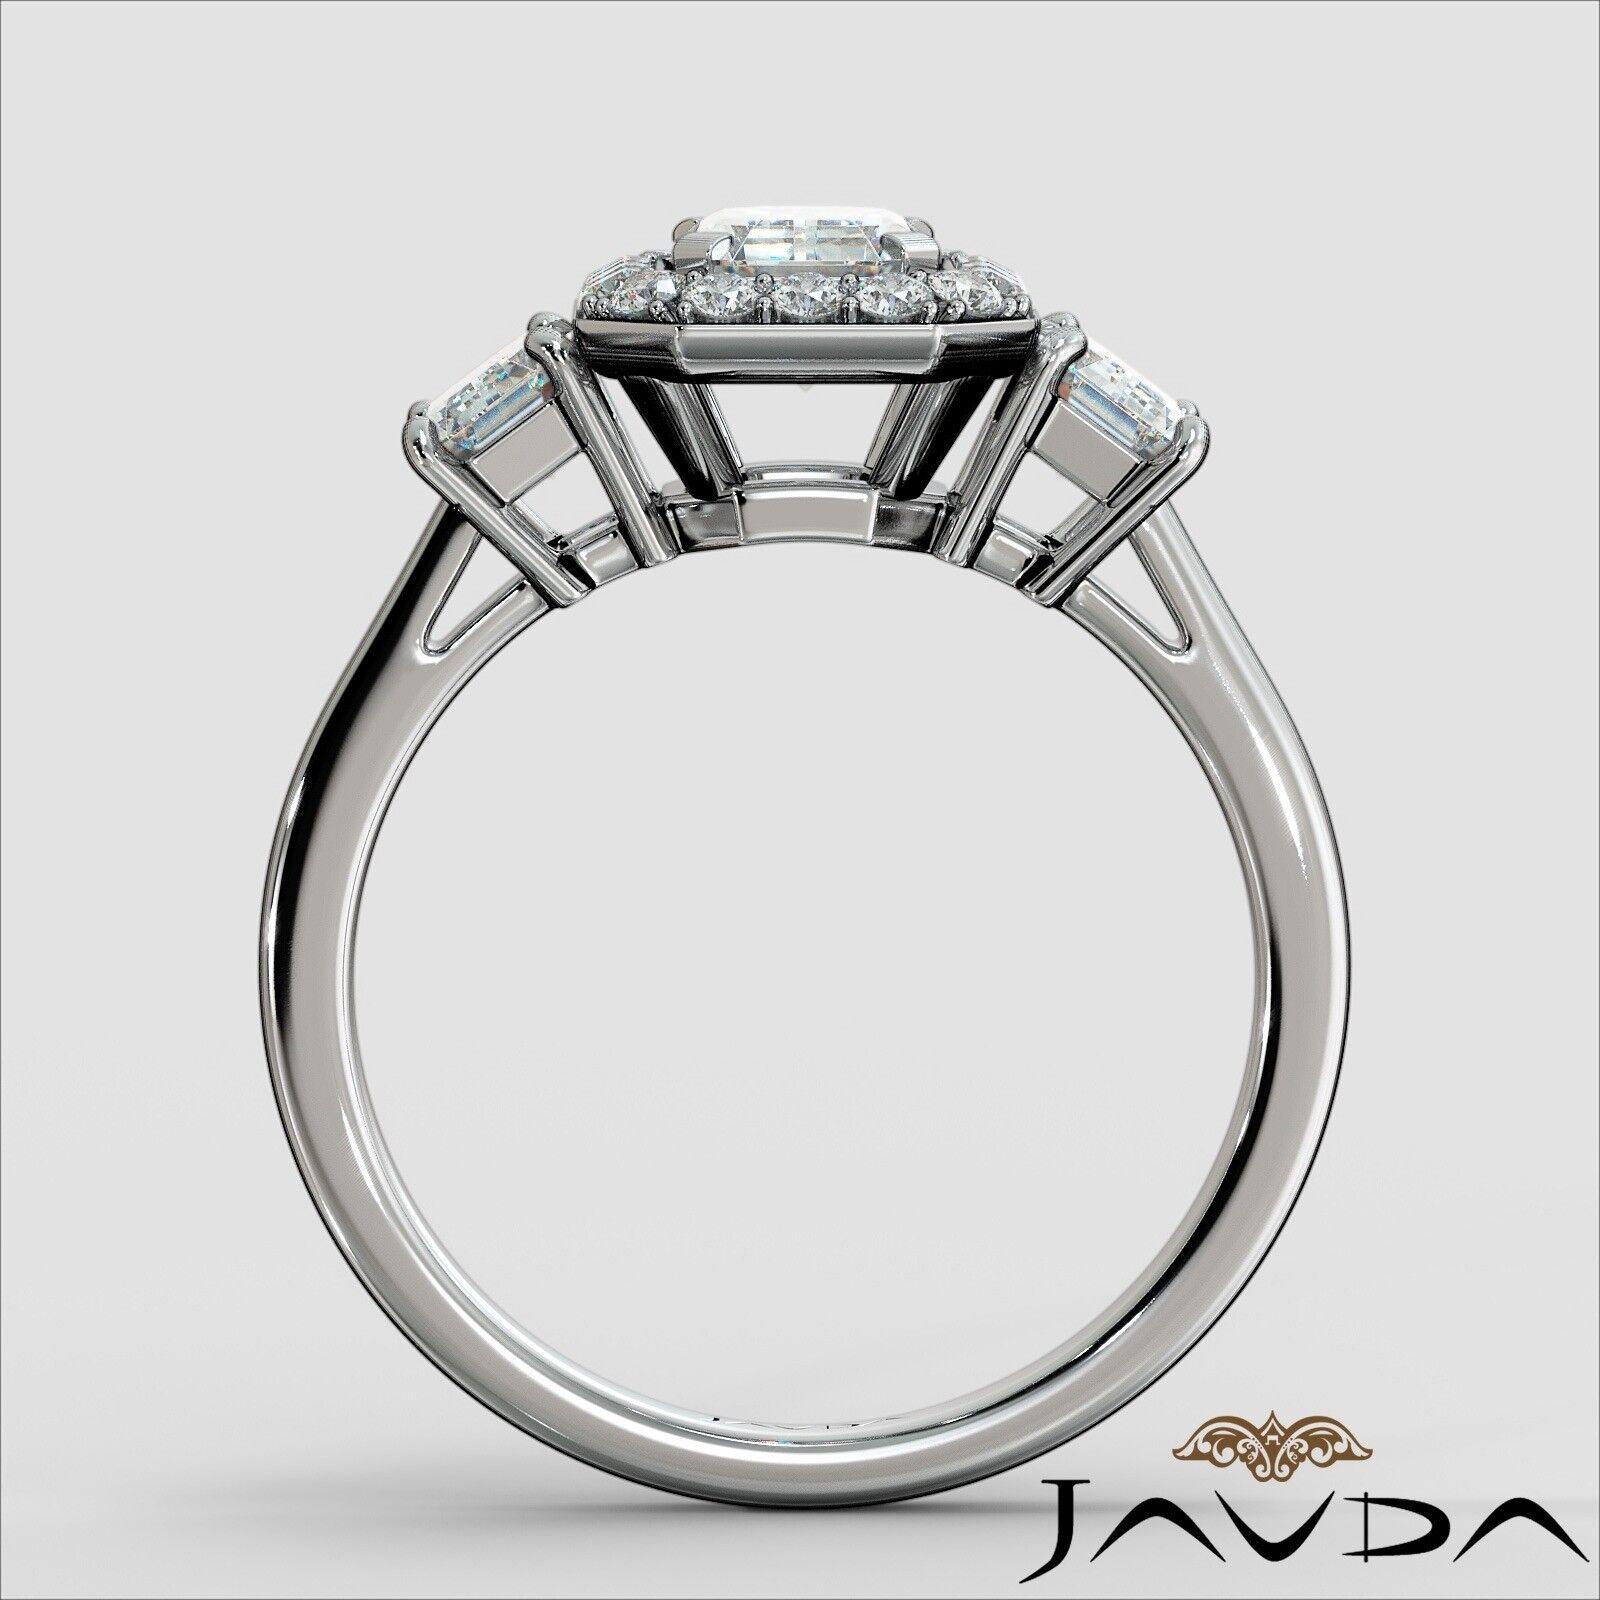 1.55ctw 3 Stone Halo Pave Emerald Diamond Engagement Ring GIA F-SI2 White Gold 3